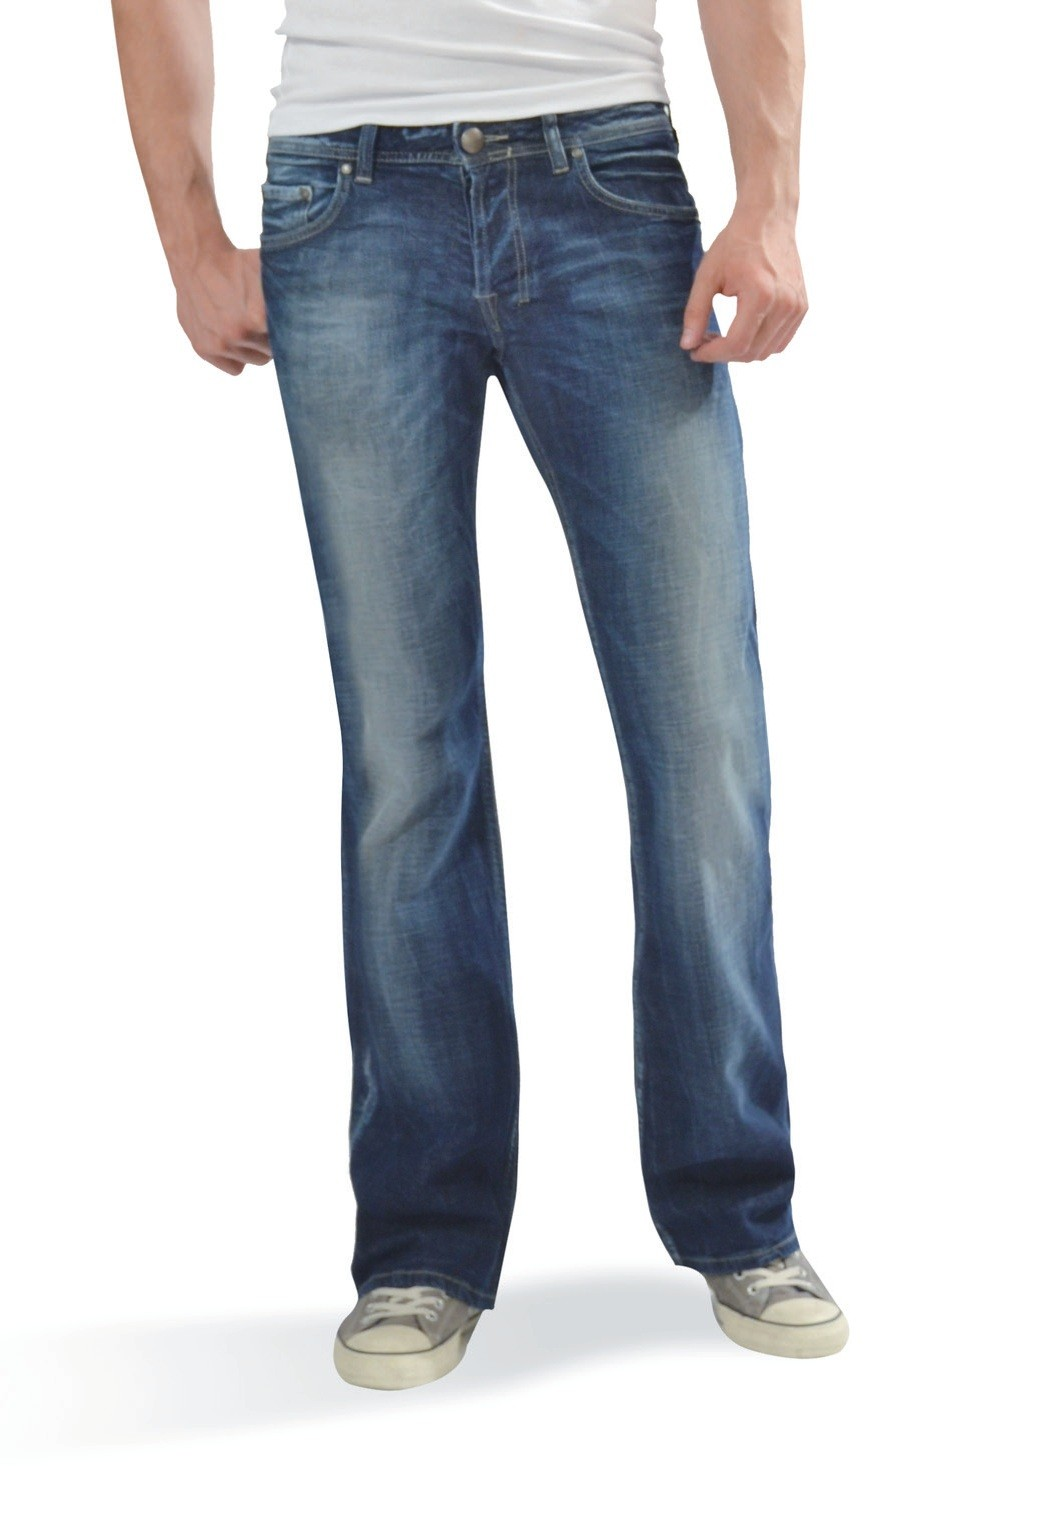 ltb herren jeans tinman bootcut dark blue used wash neu ebay. Black Bedroom Furniture Sets. Home Design Ideas